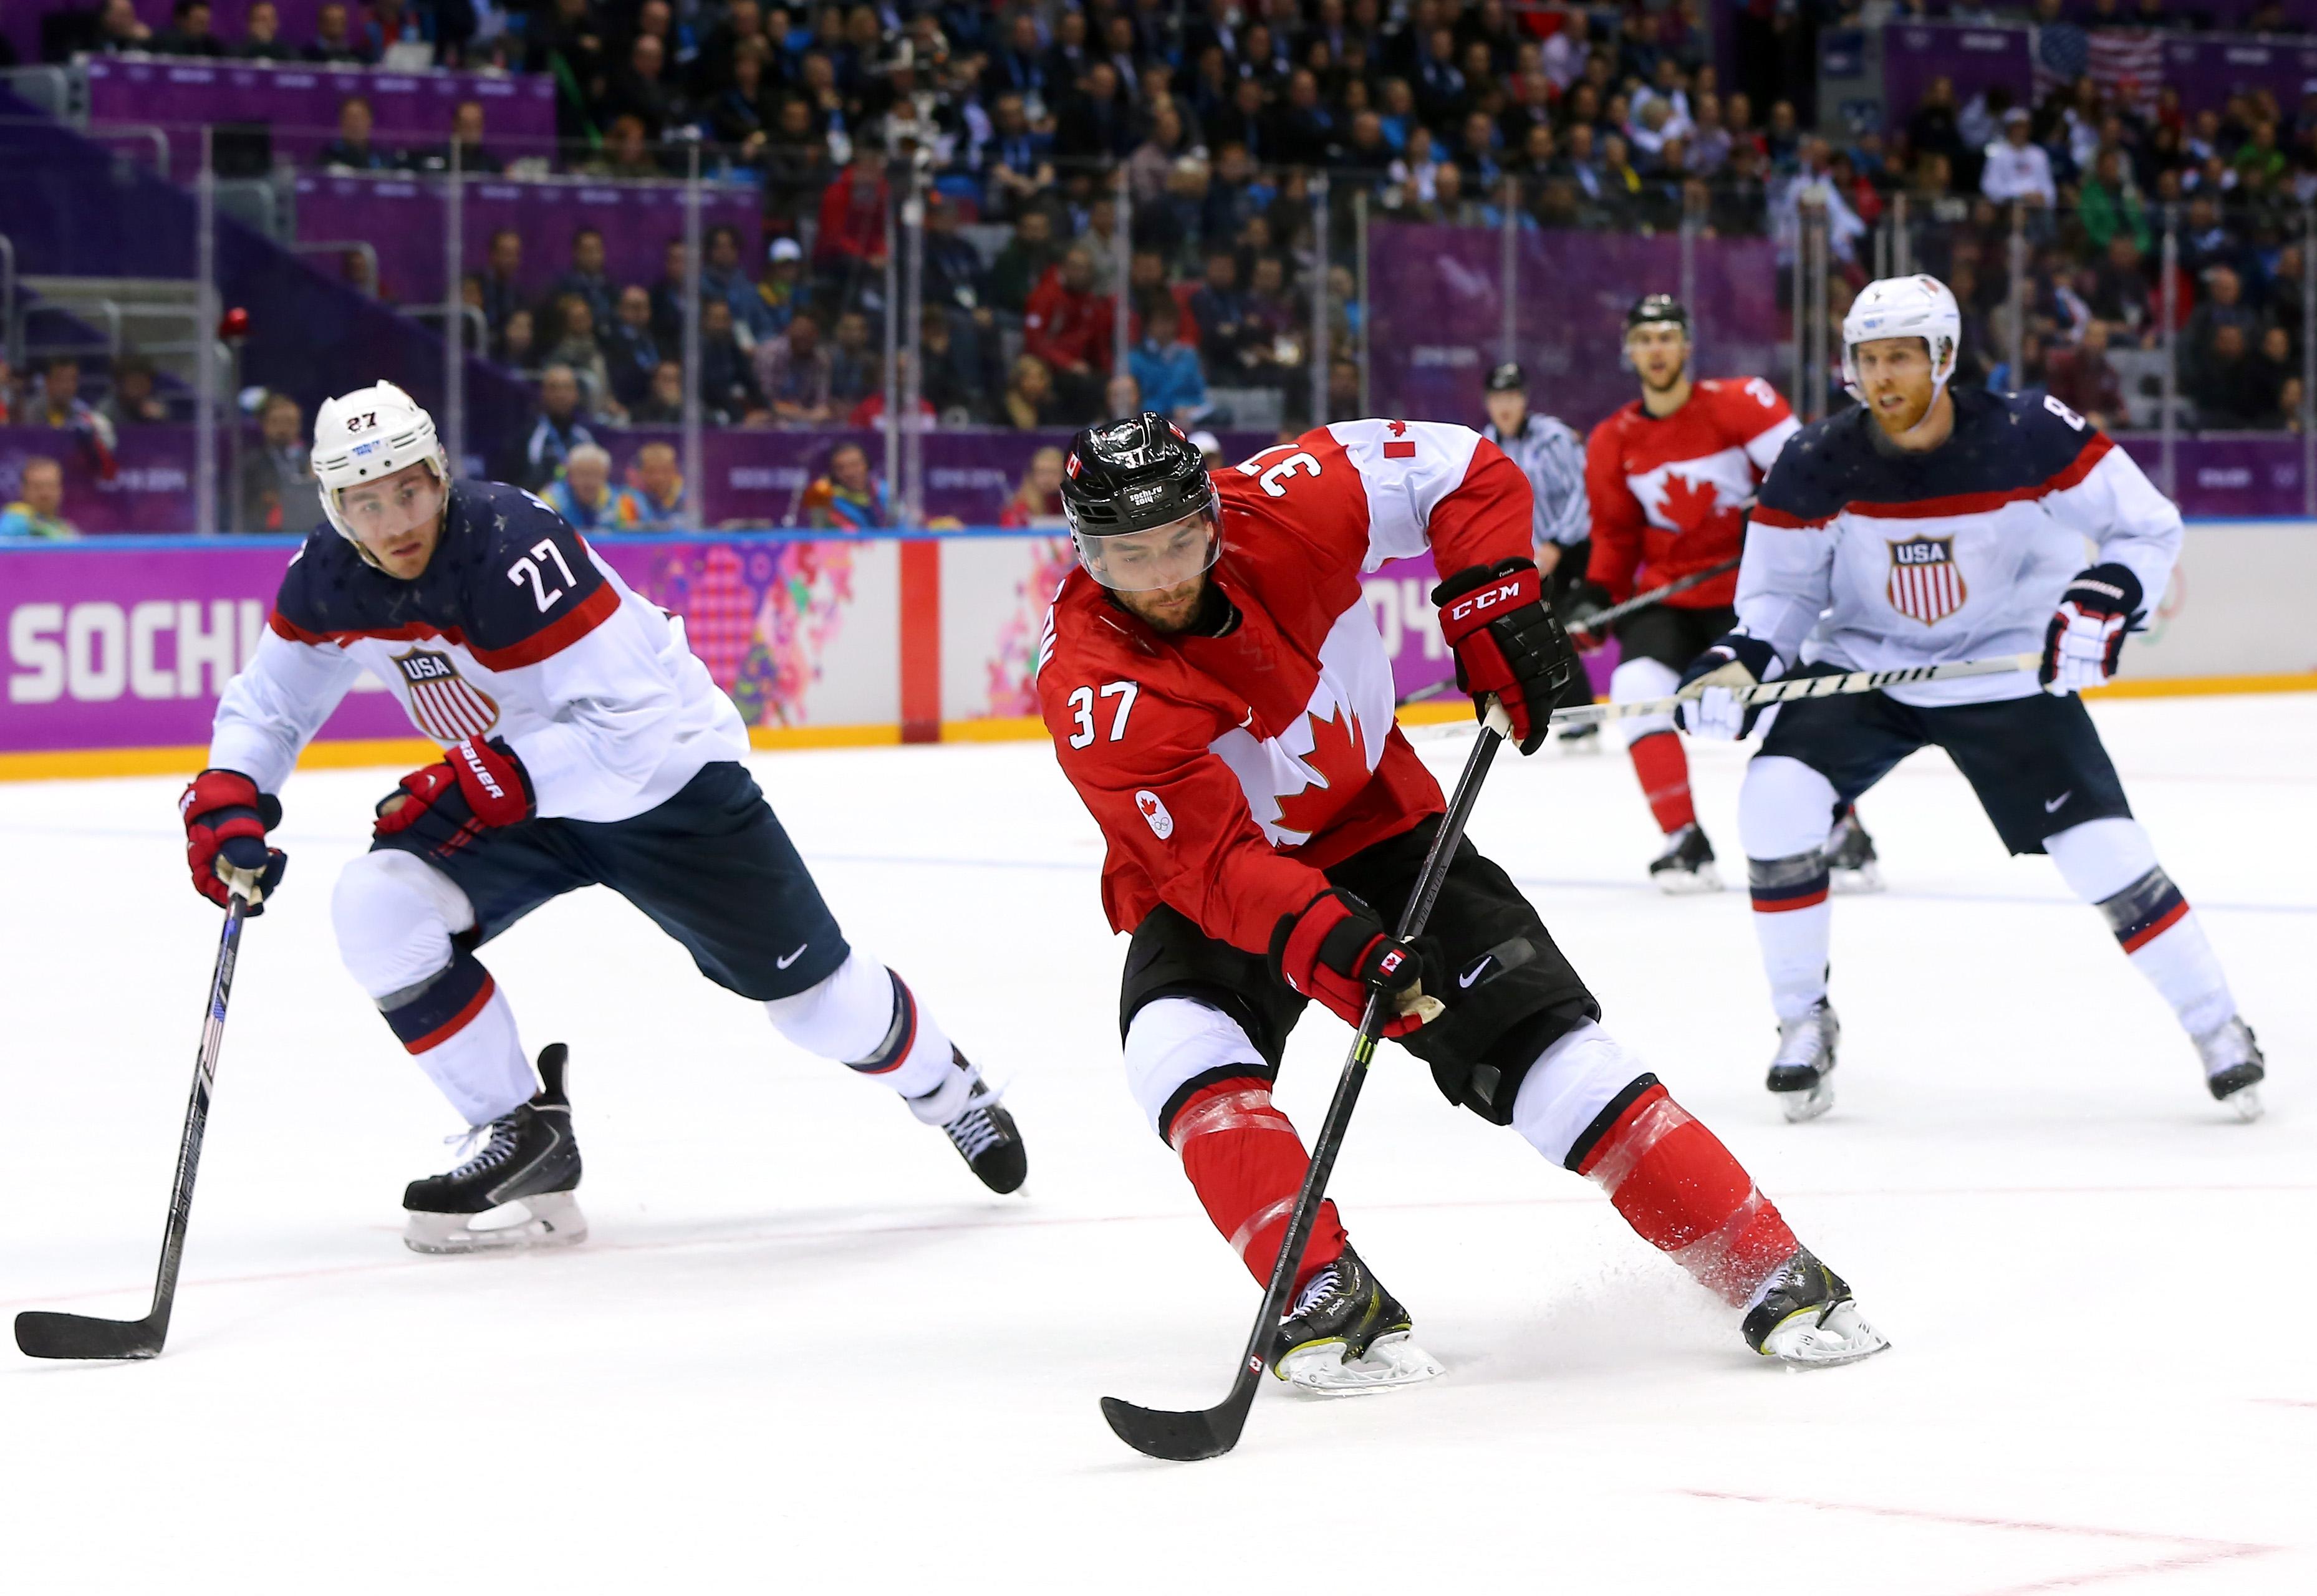 Ice Hockey HD wallpapers, Desktop wallpaper - most viewed